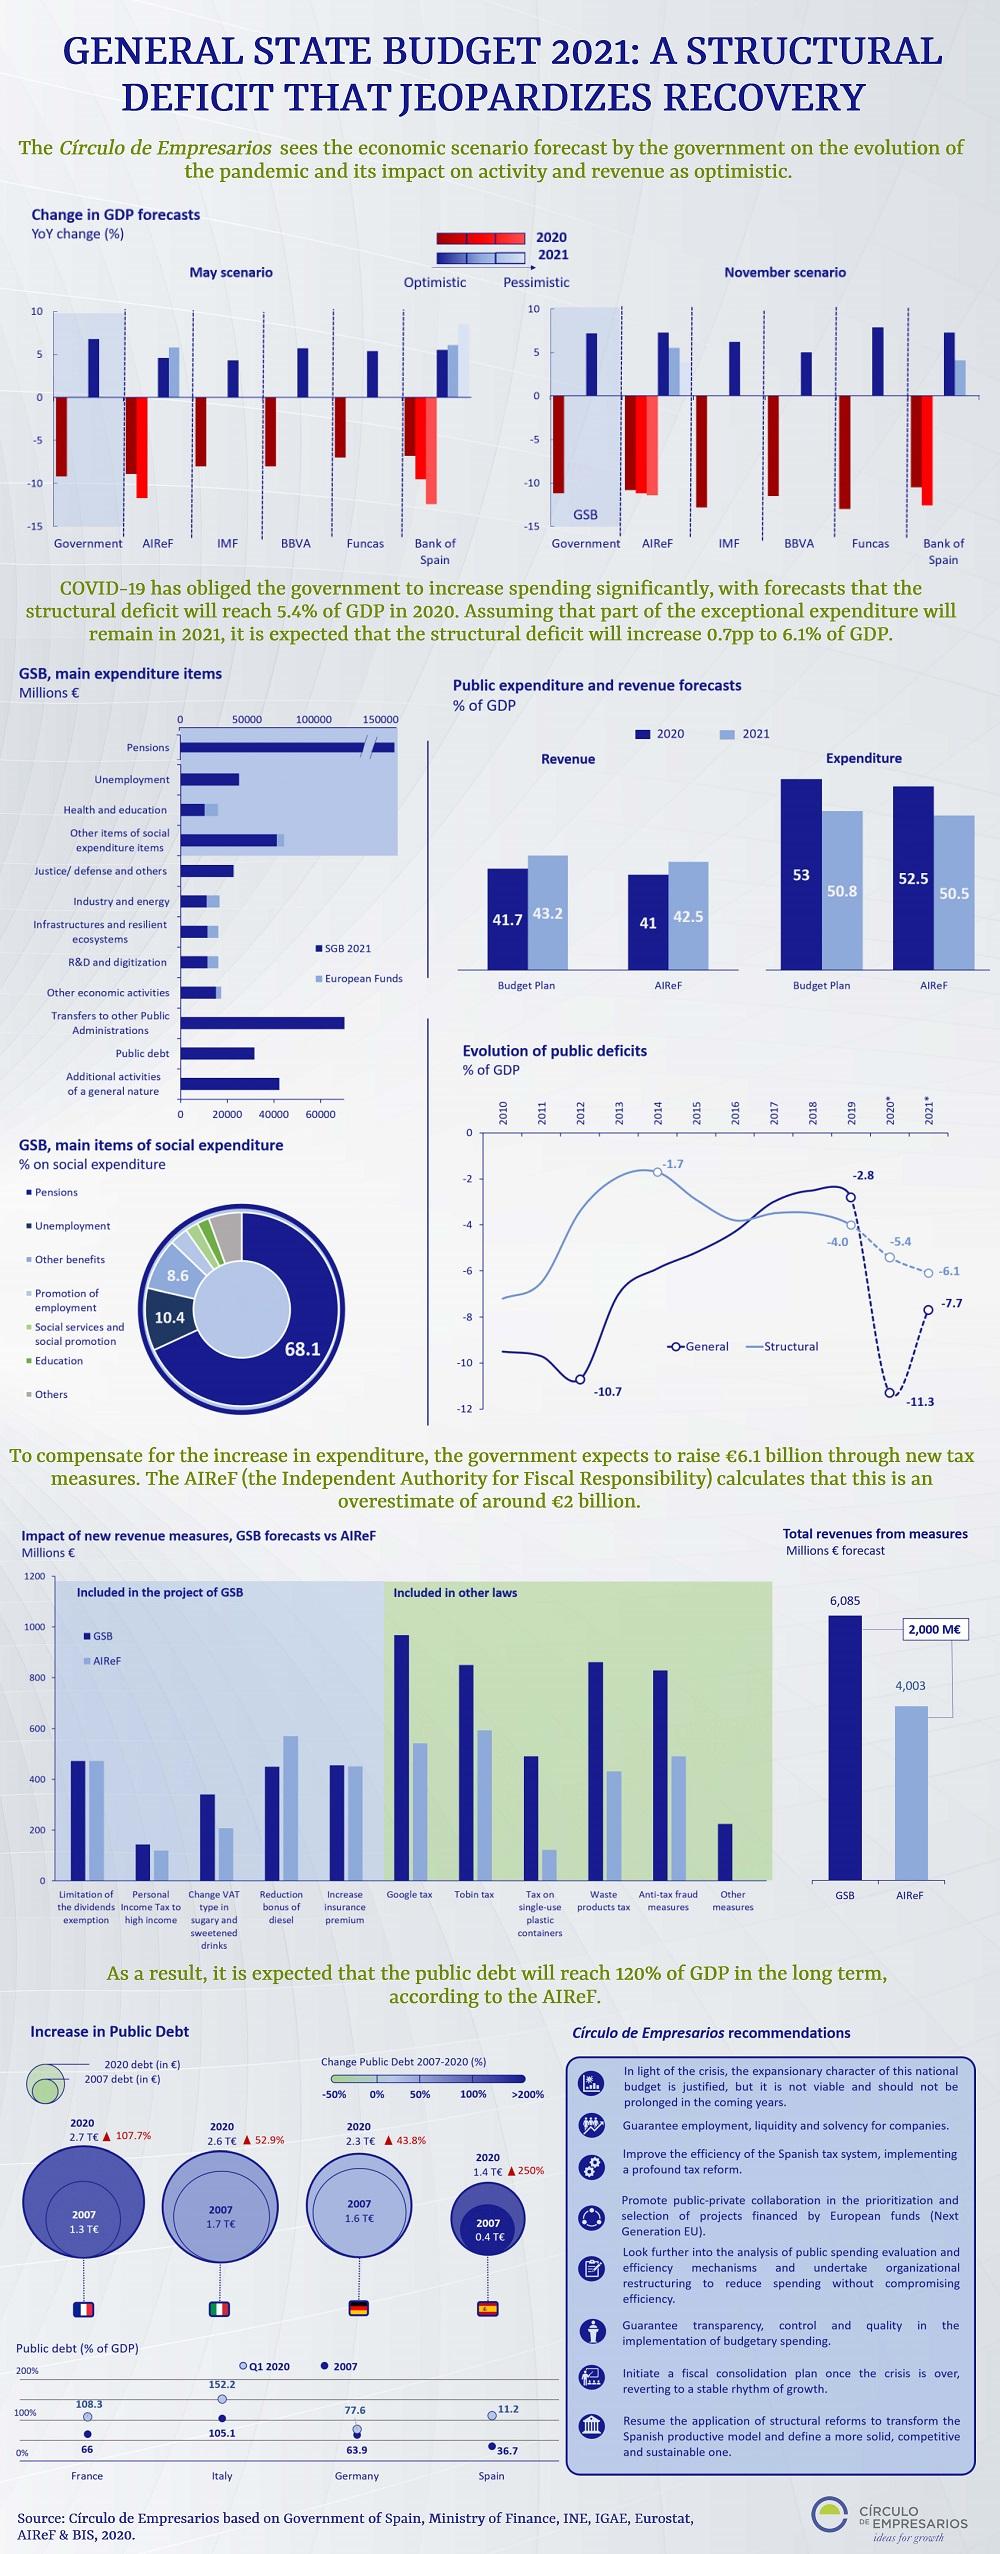 GENERAL-STATE-BUDGET-2021-A-STRUCTURAL-November-2020-Circulo-de-Empresarios